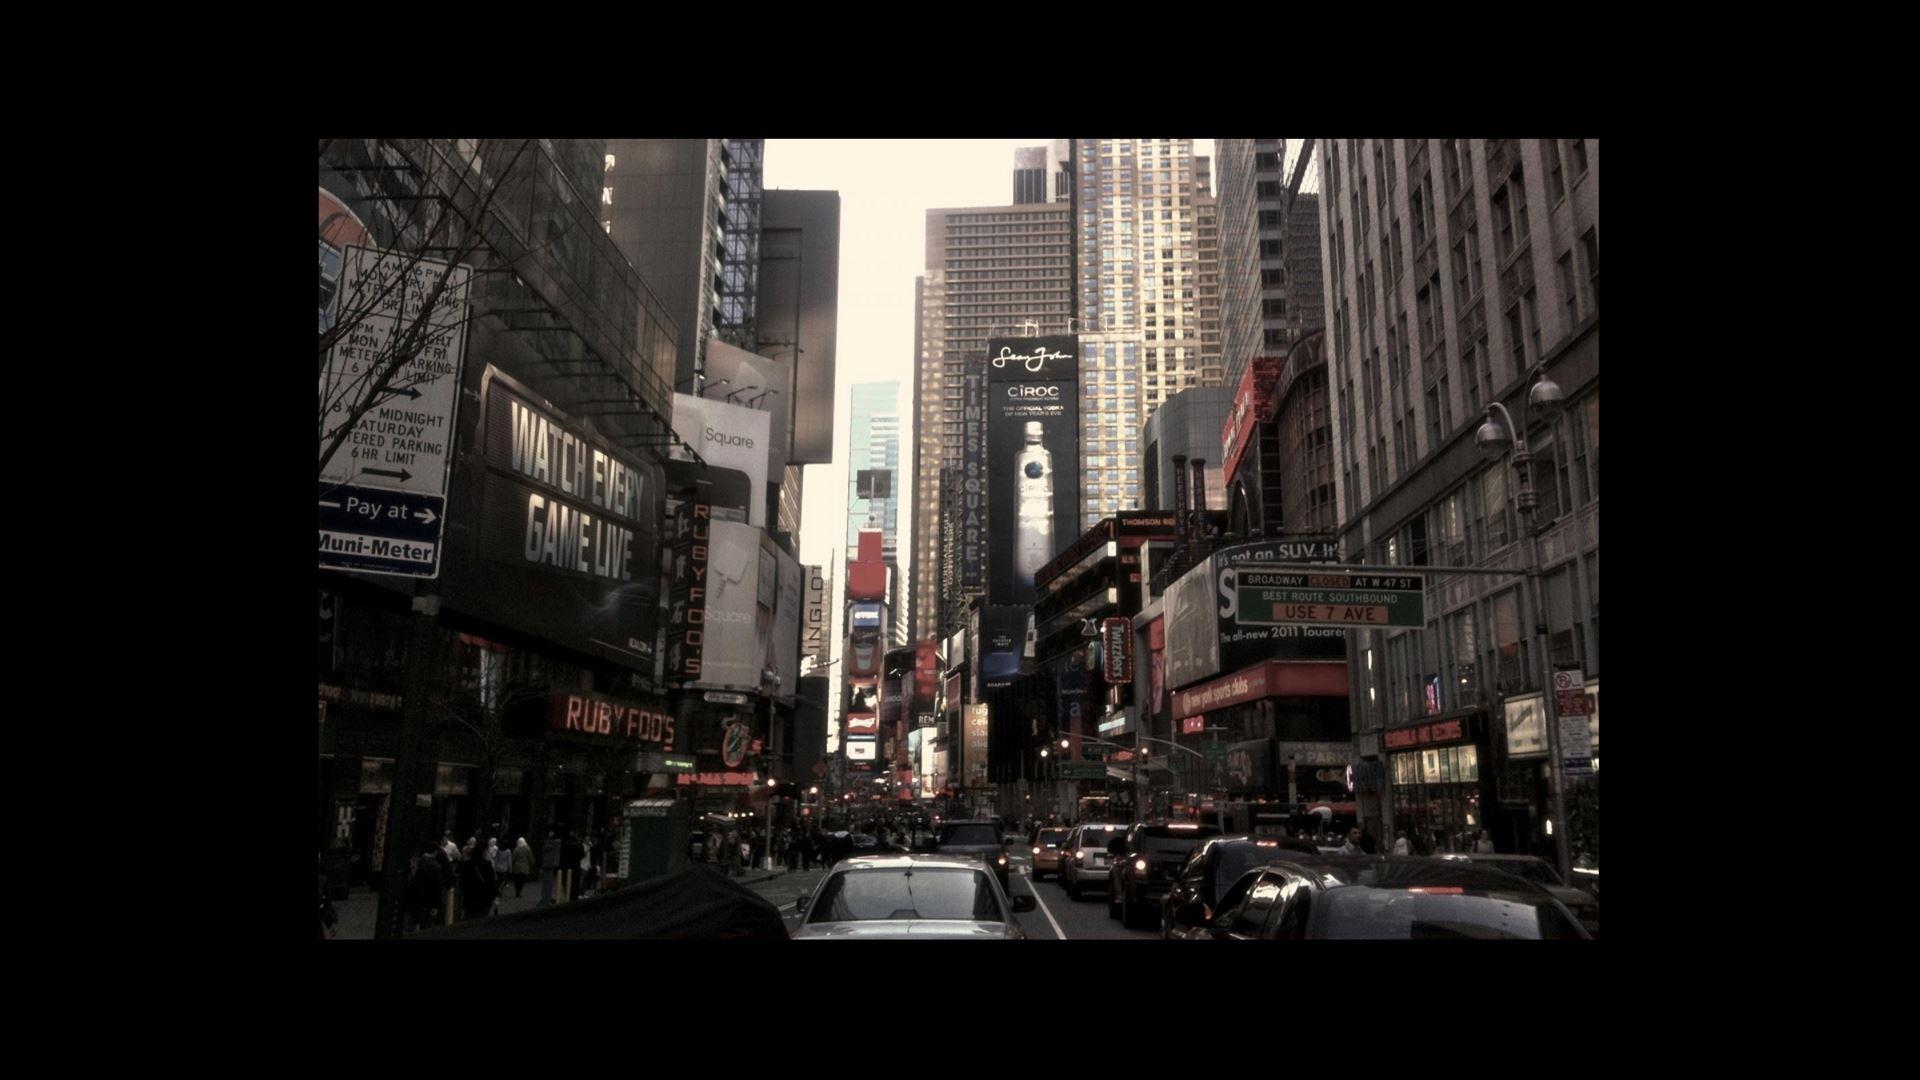 New York City Street Mac Wallpaper Download | Free Mac ...